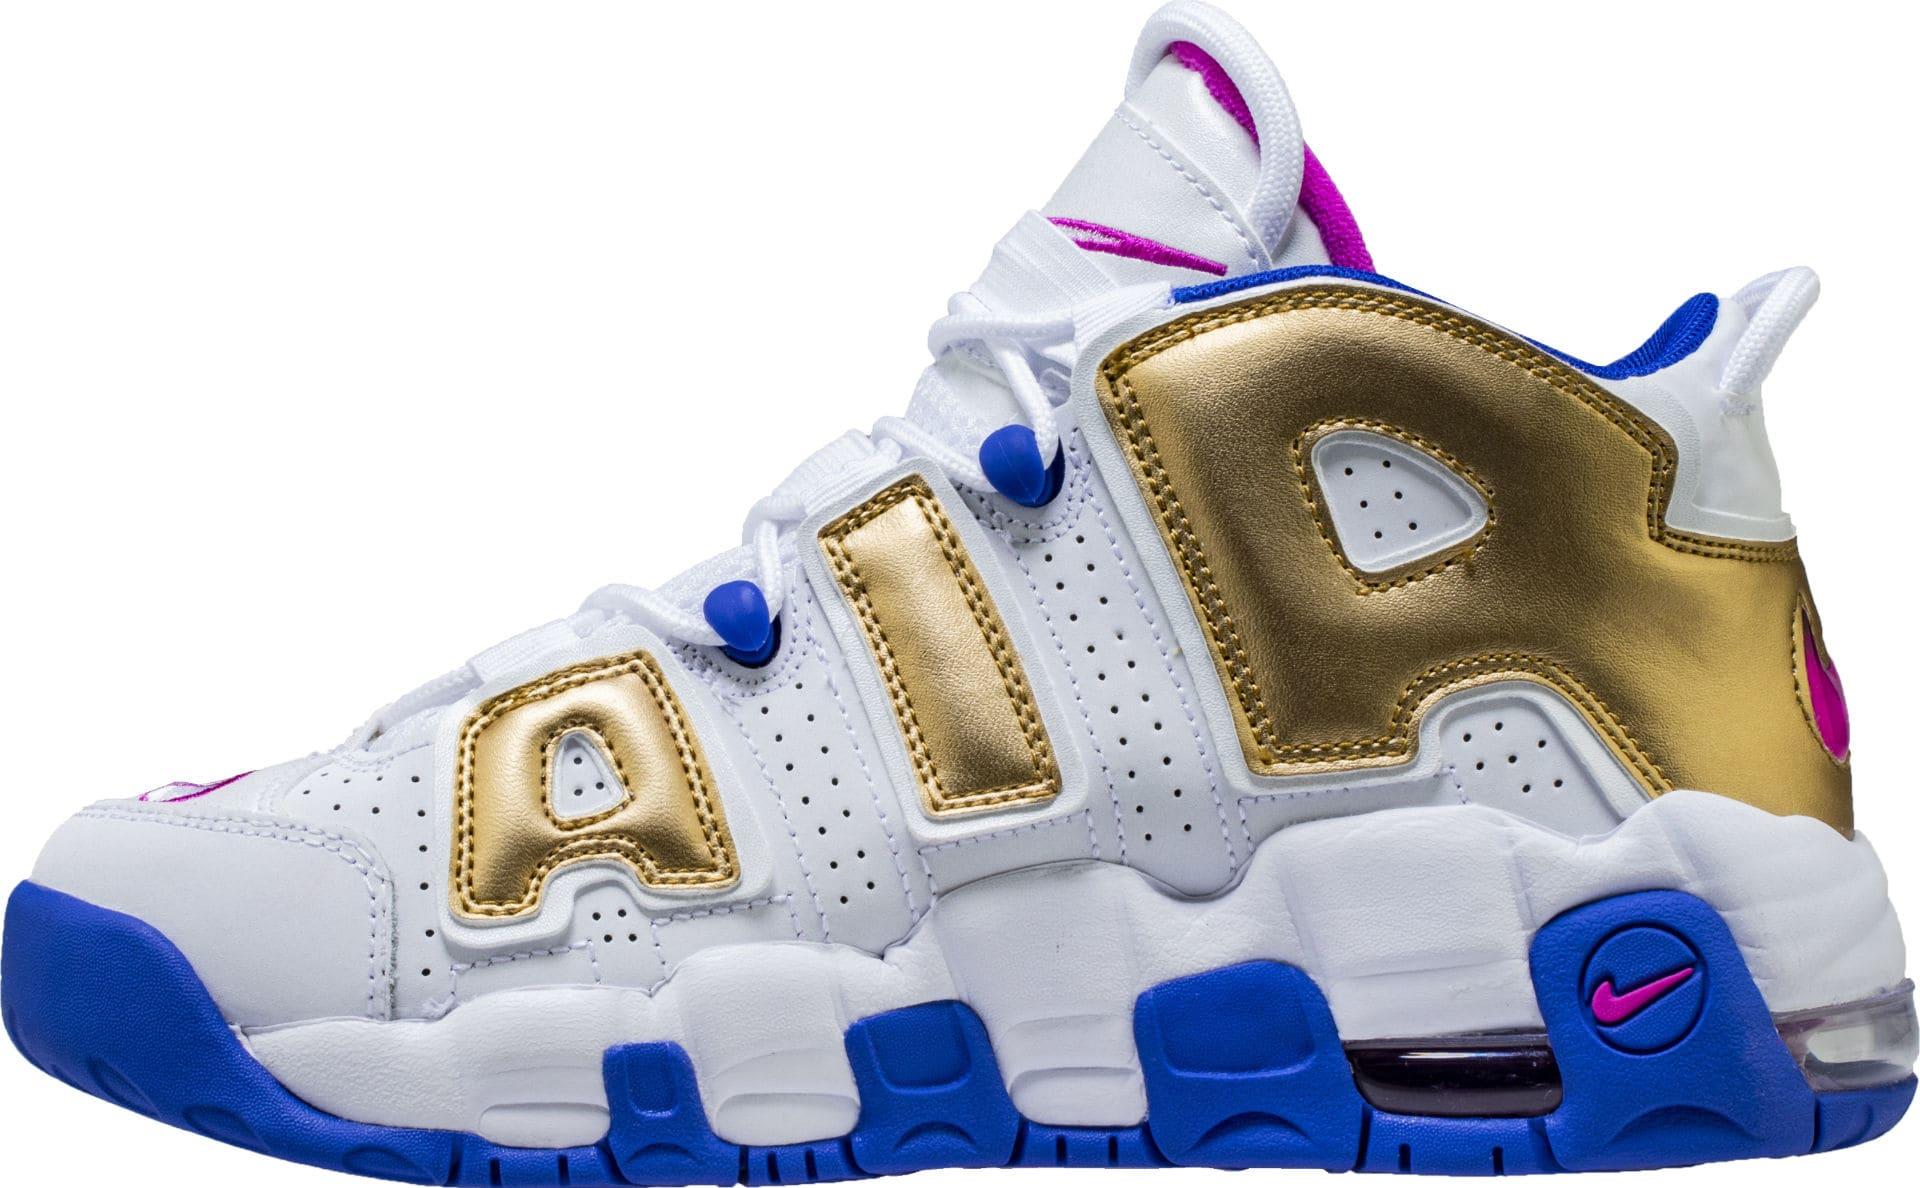 usa purple blue mens nike air more uptempo shoes 32b48 5bc36 03bbc353f